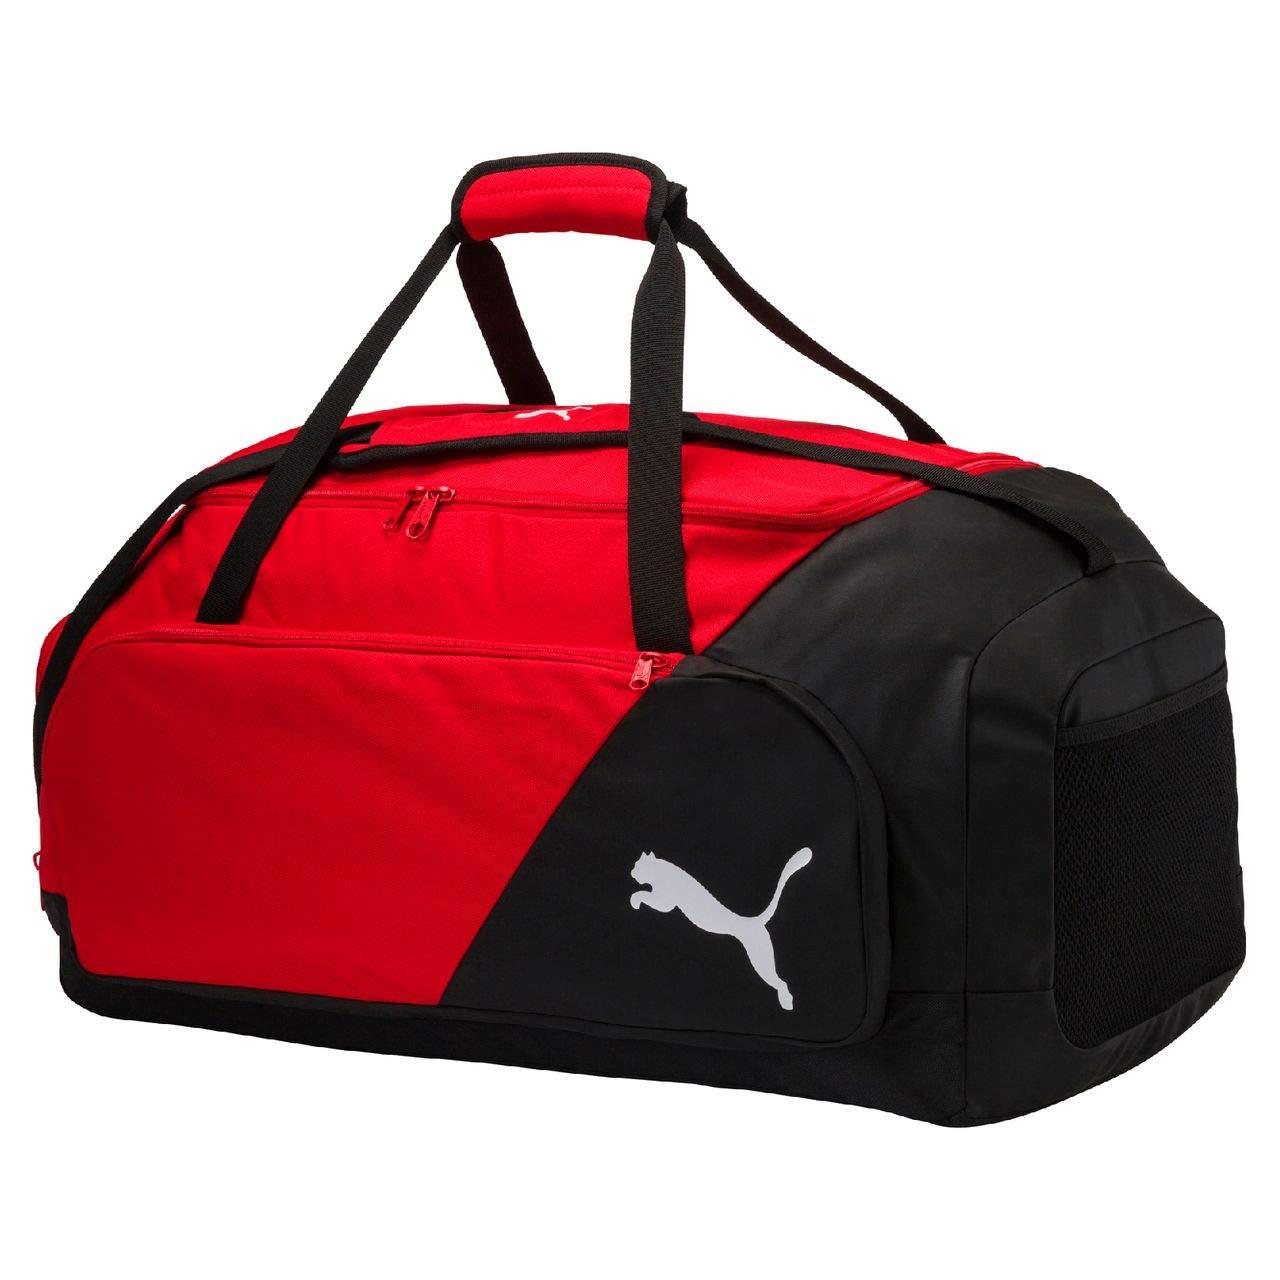 981e51b05c26 Puma Liga Large Bag  Amazon.co.uk  Sports   Outdoors